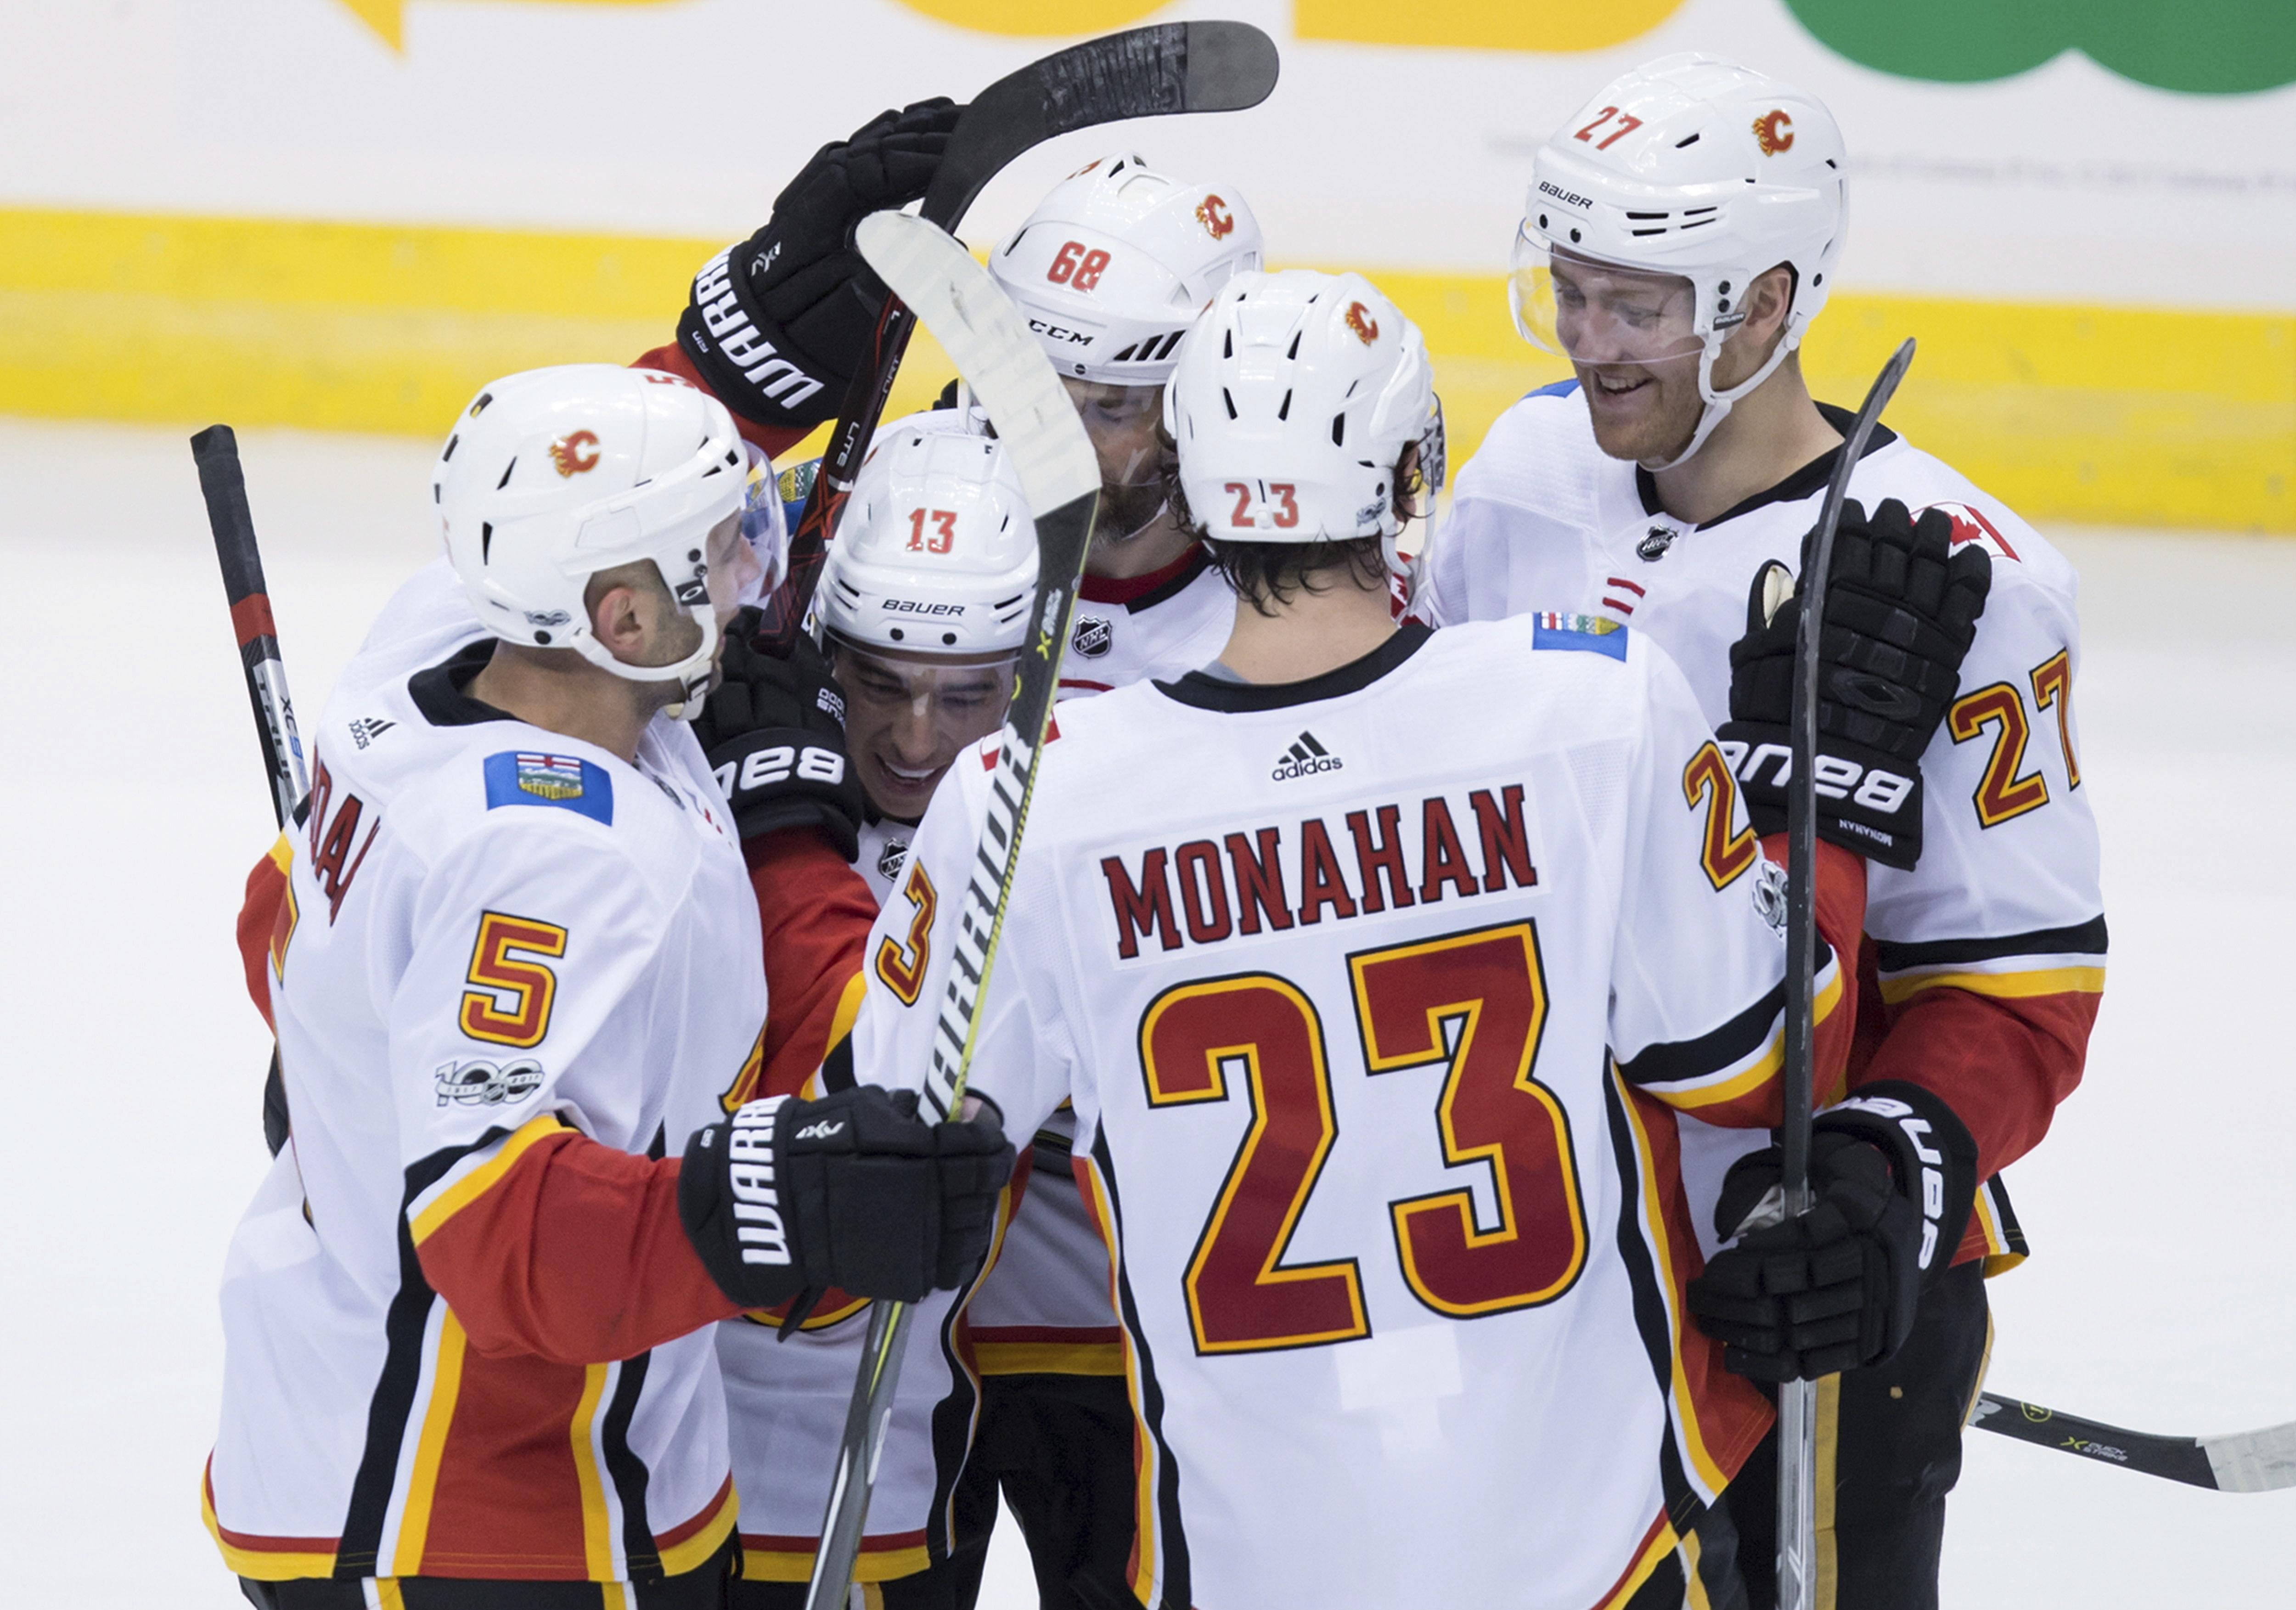 Flames_canucks_hockey_64400